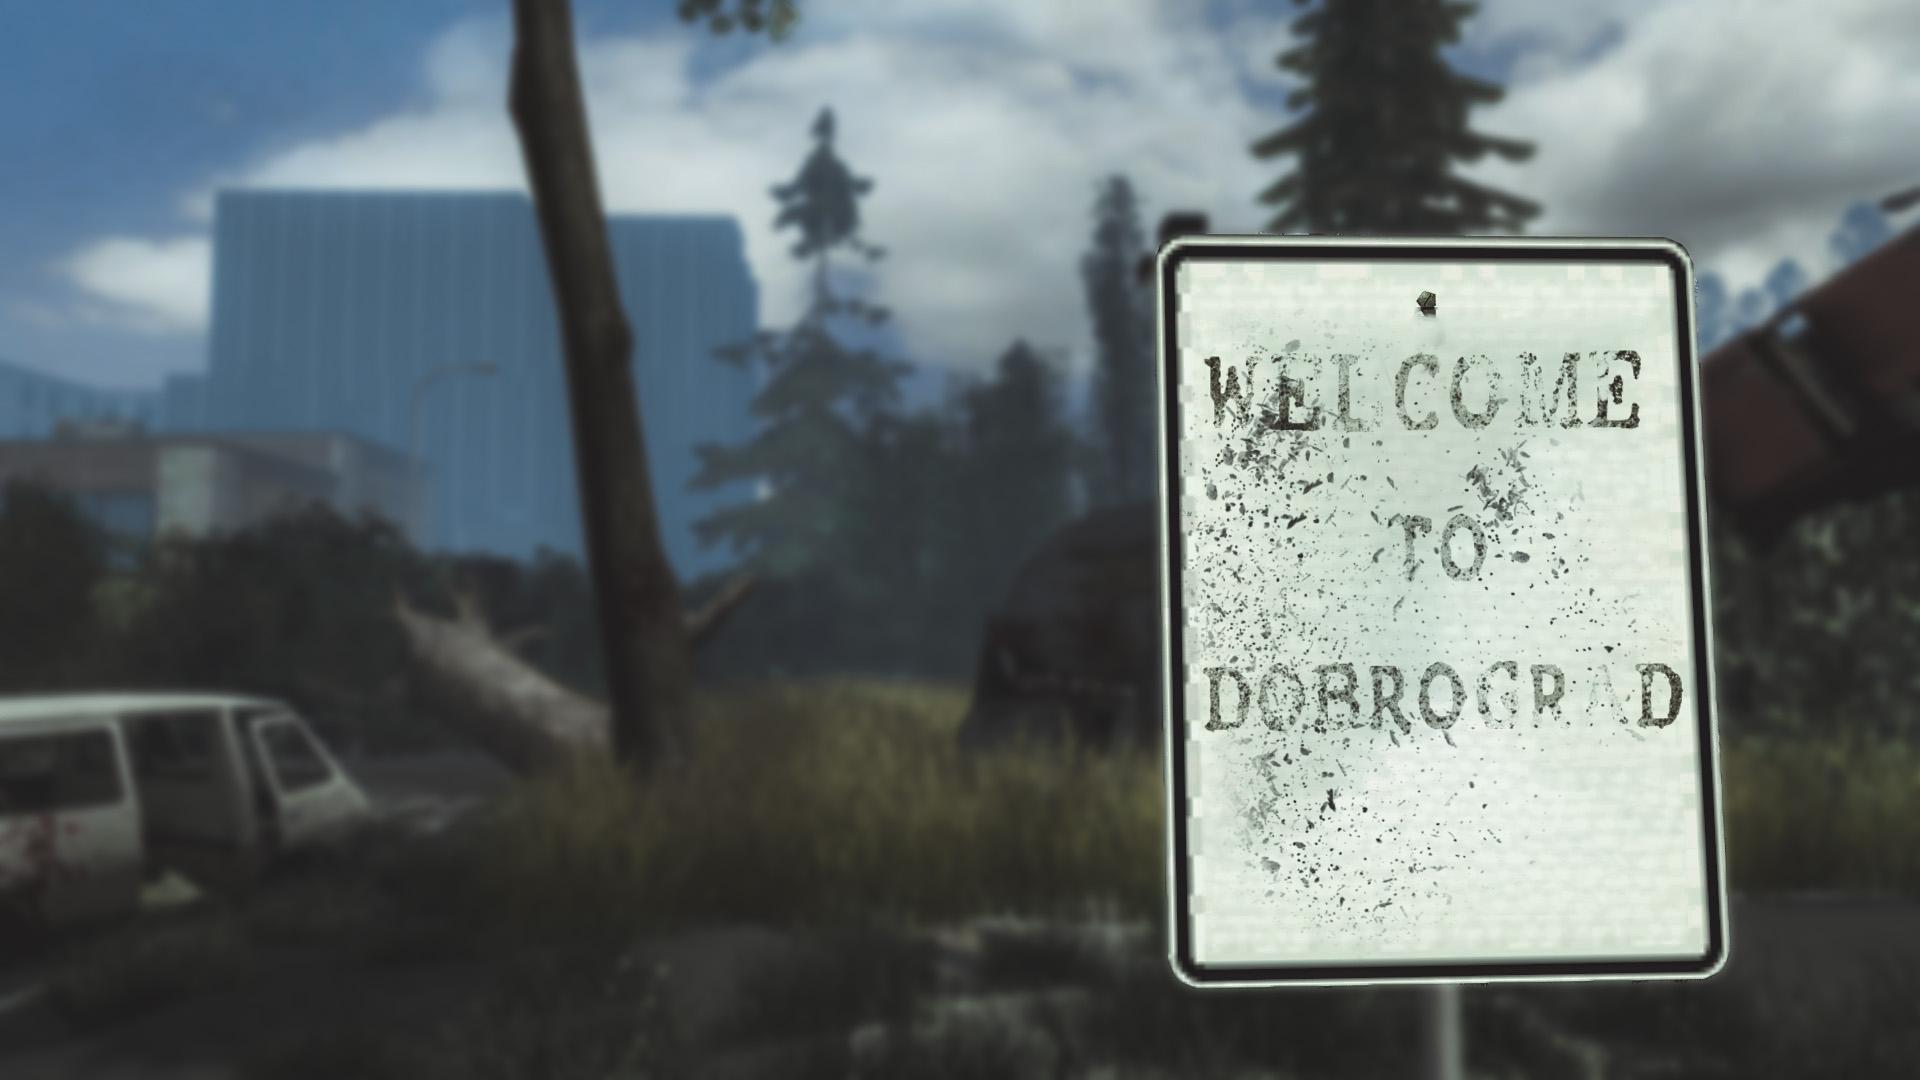 Welcome to Dobrograd